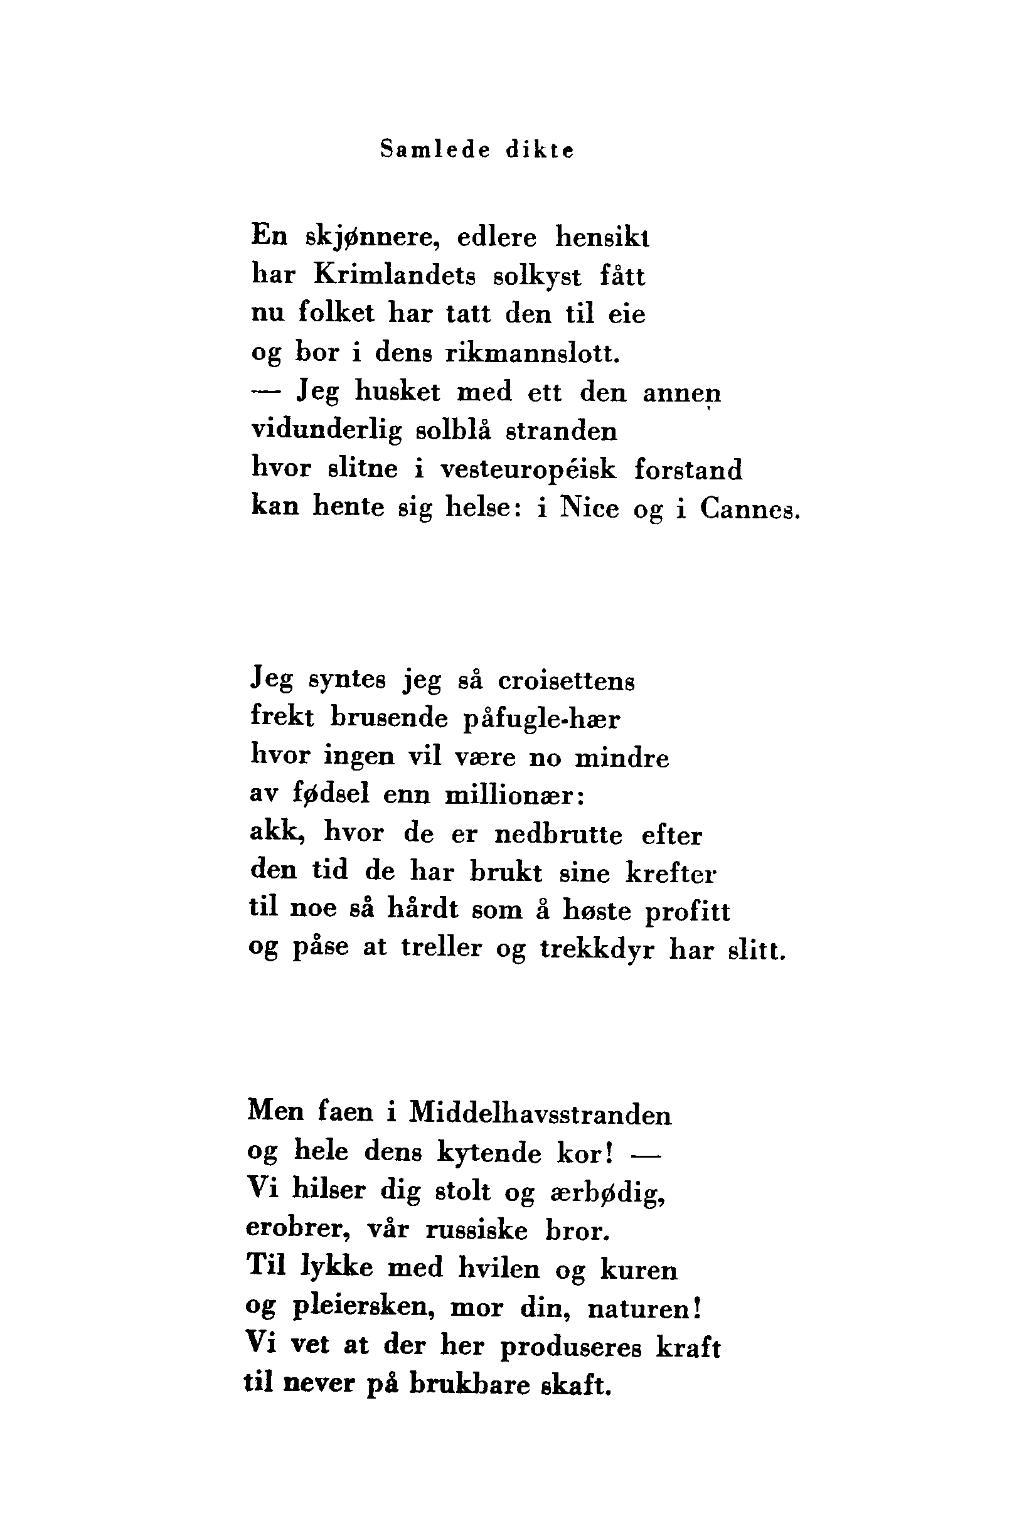 dikt om lykke